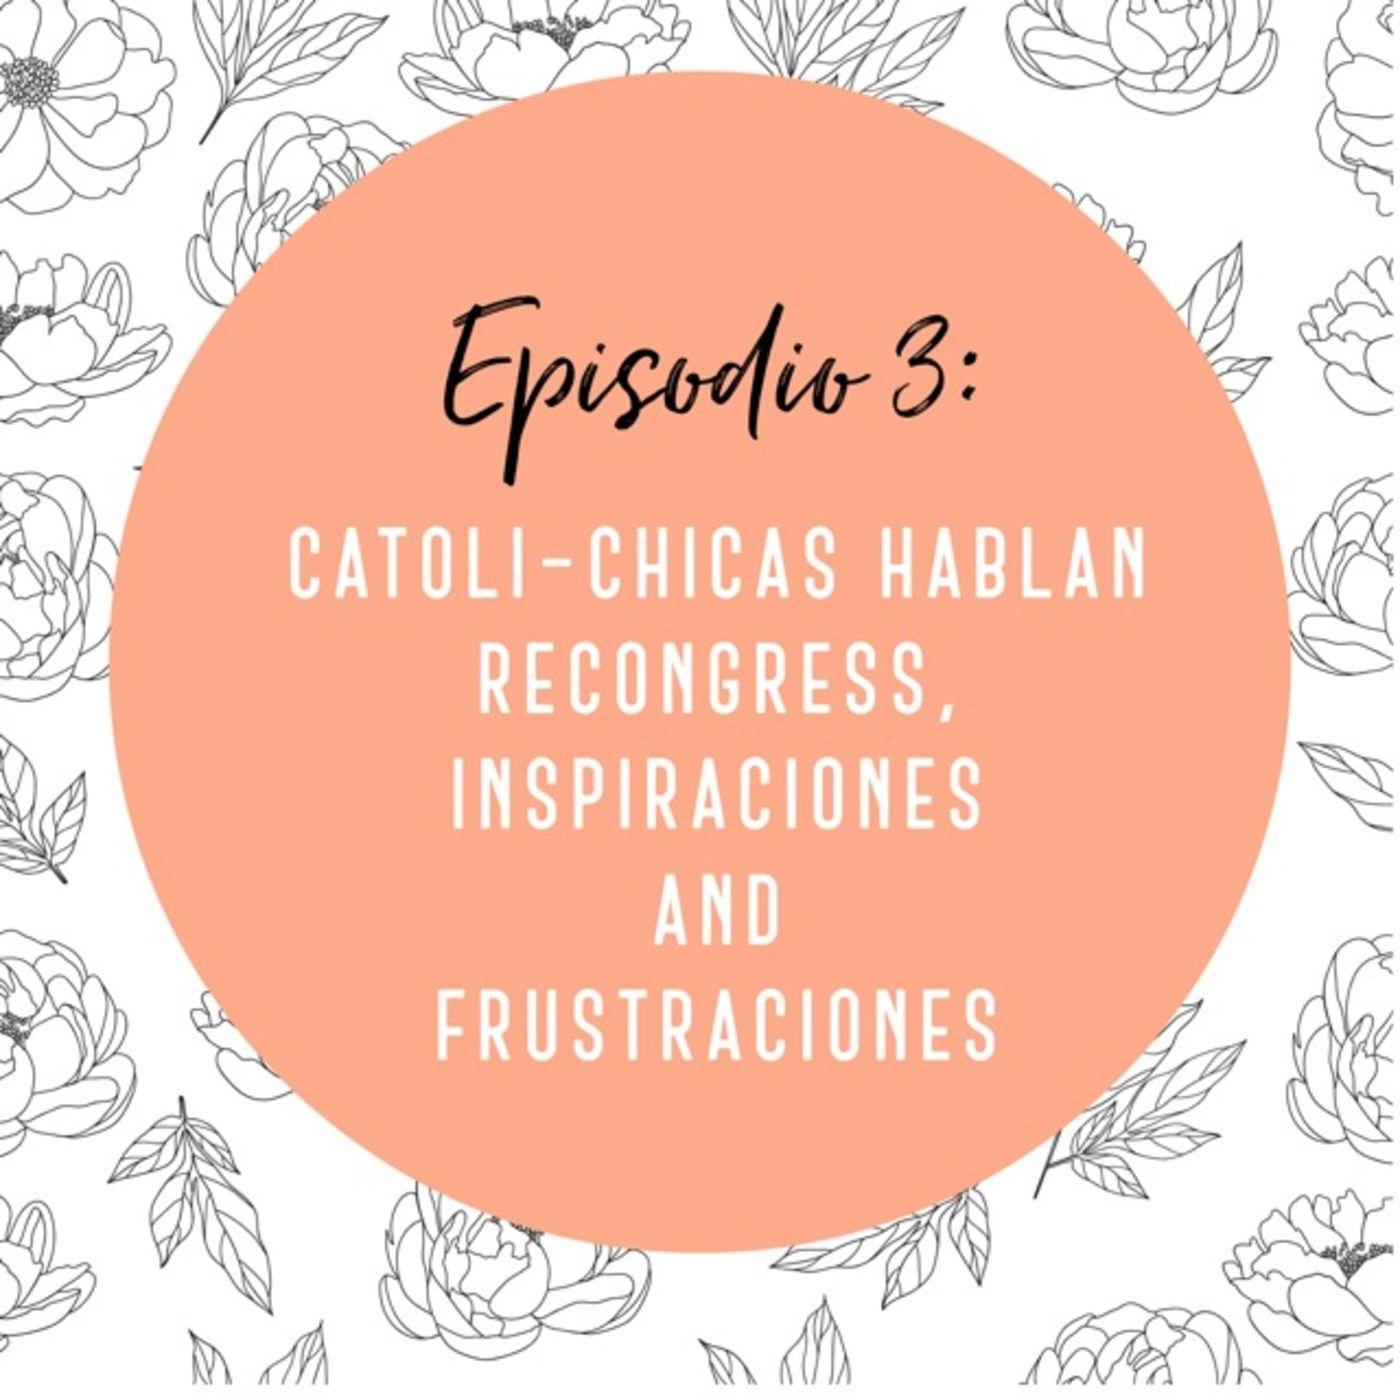 Episodio 3: Catoli-chicas Hablan